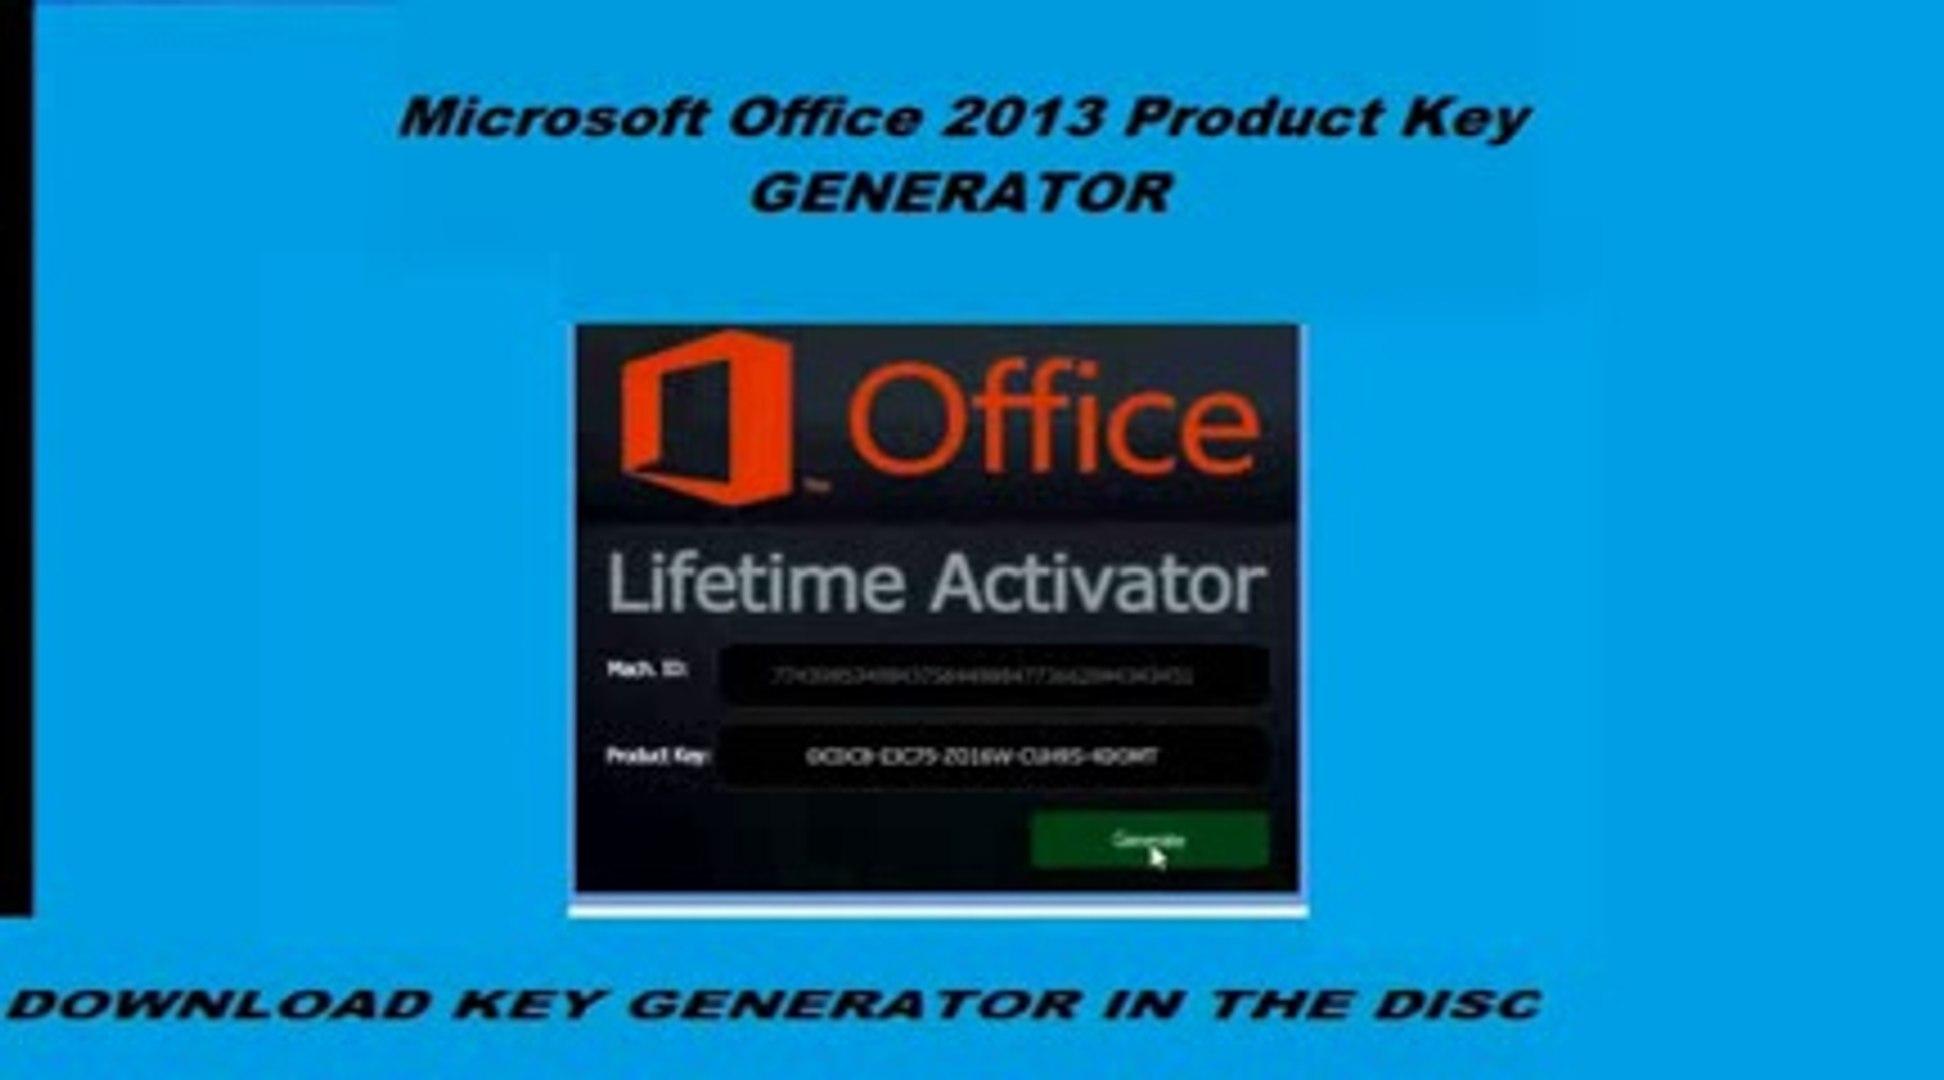 microsoft office 2013 product key generator download